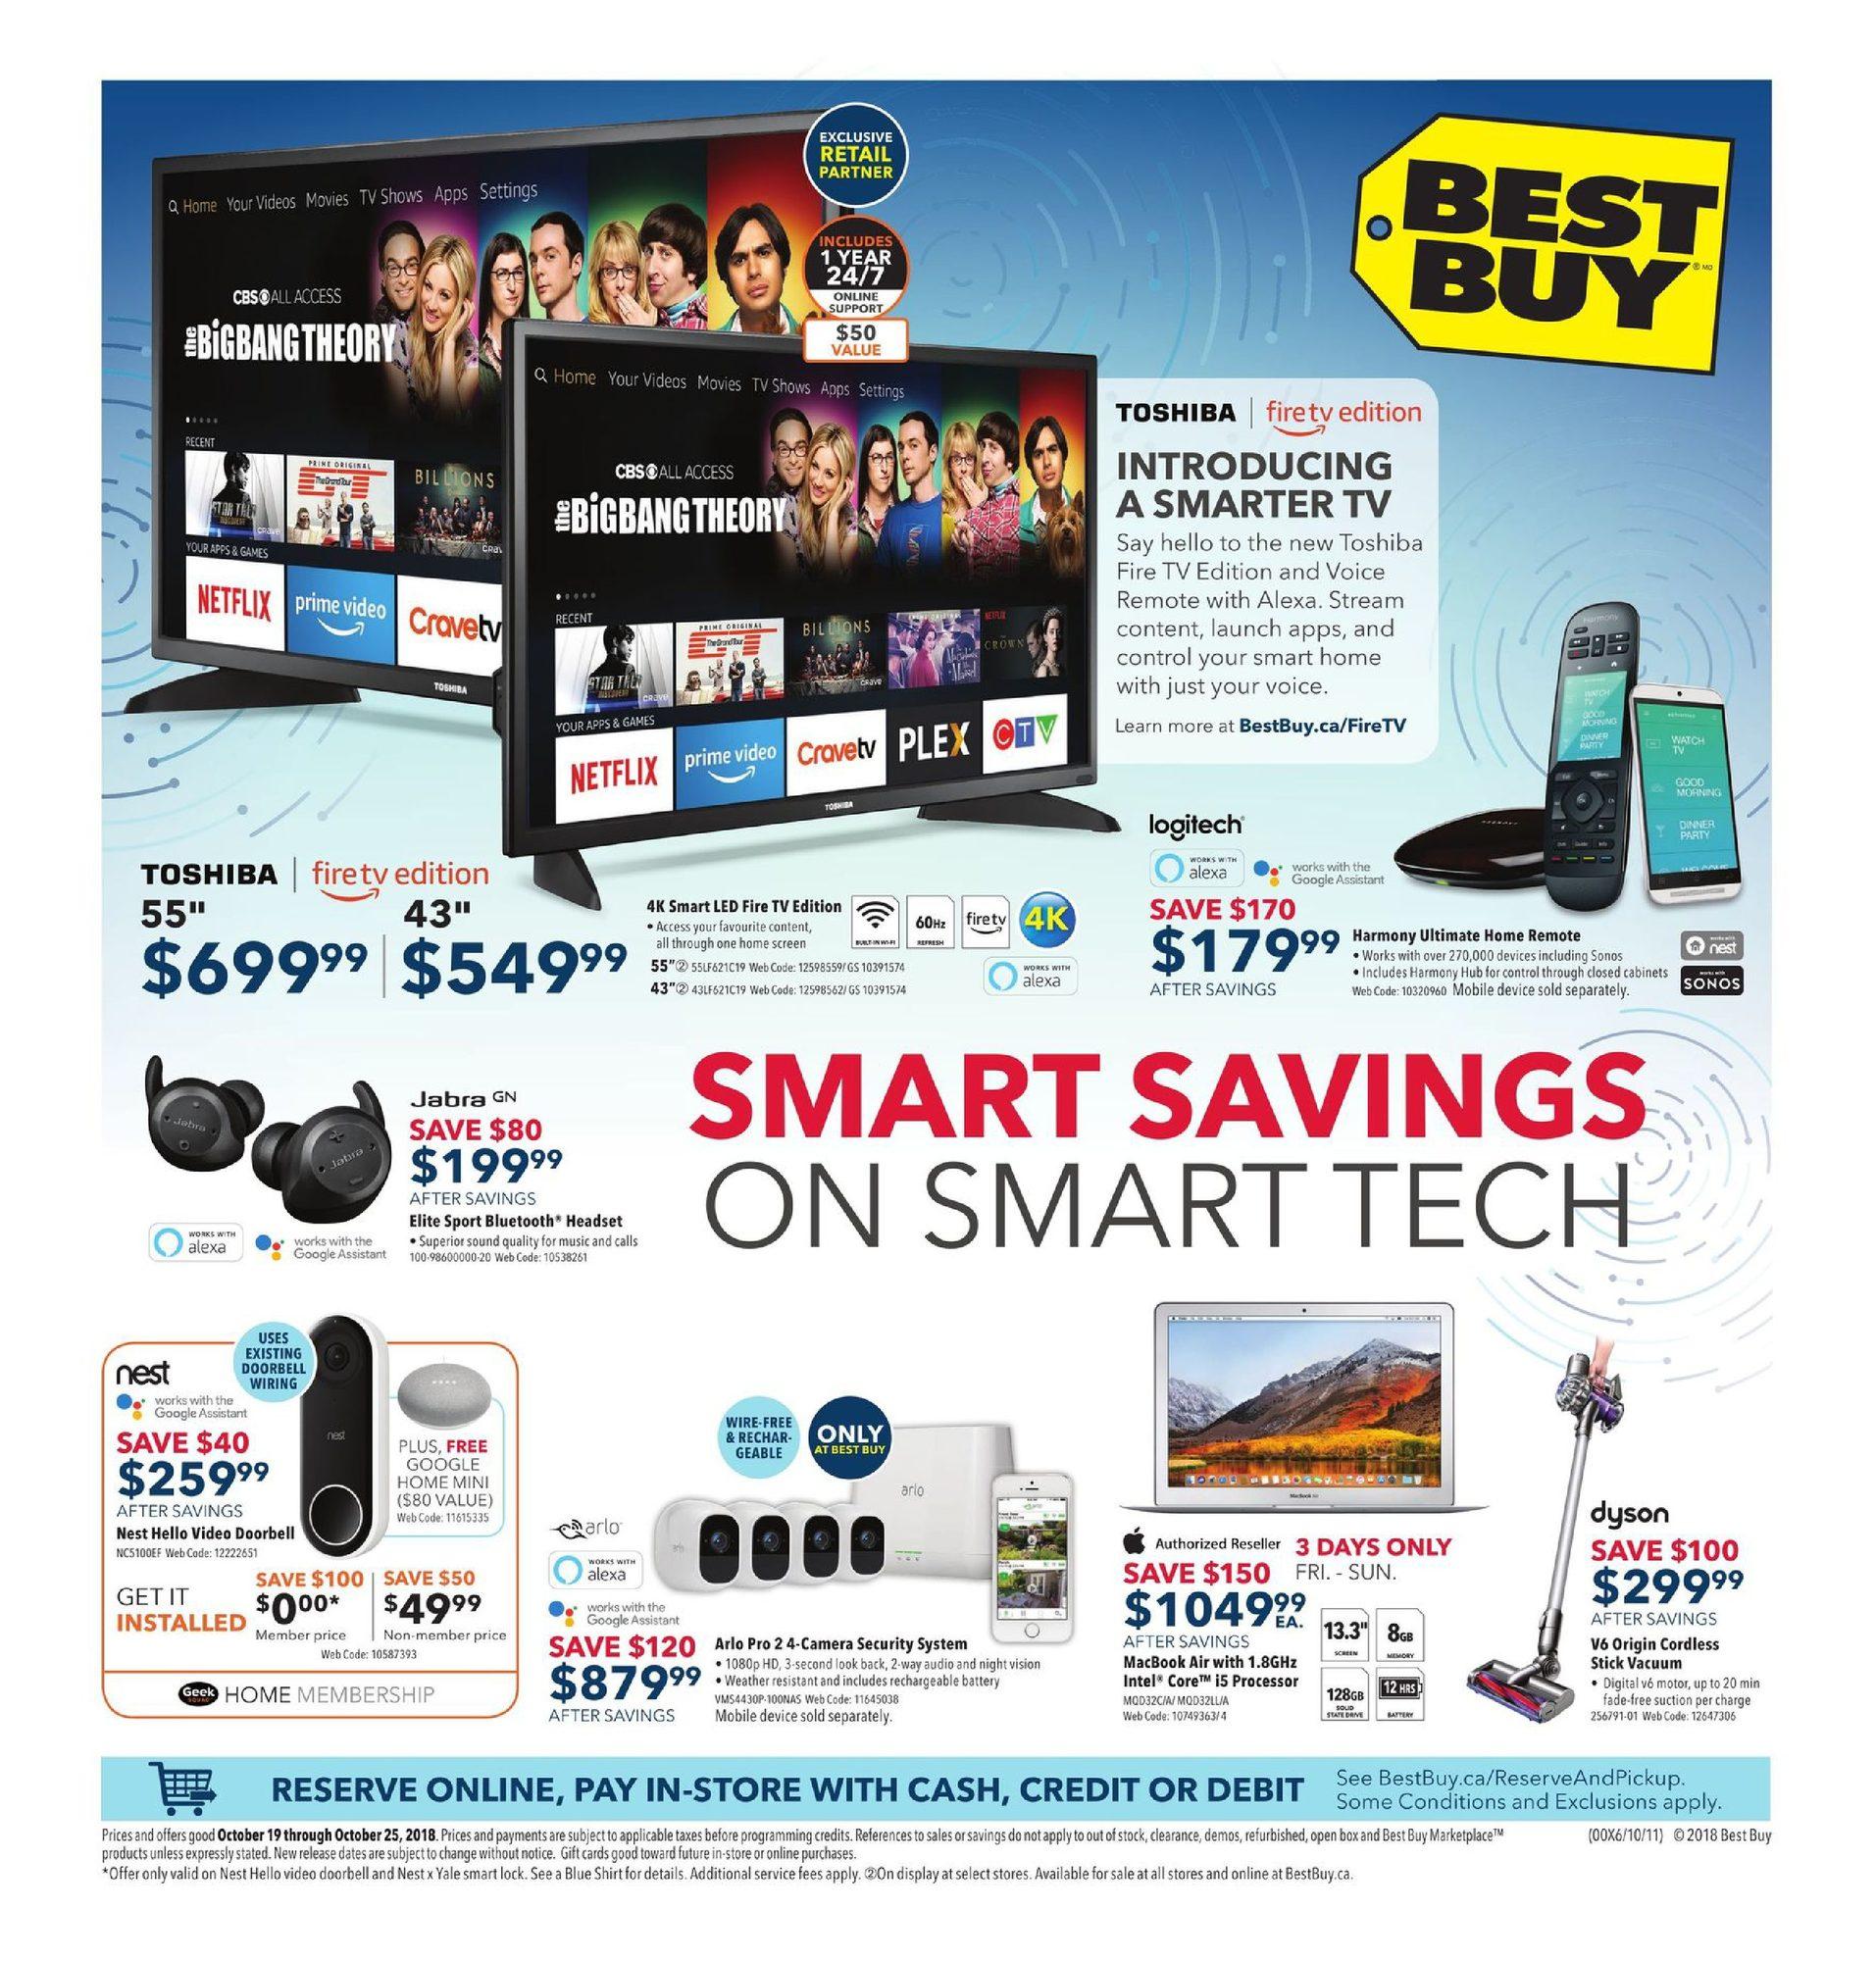 Weekly - Smart Savings On Tech - Best Buy October 19 2018 | YP Shopwise